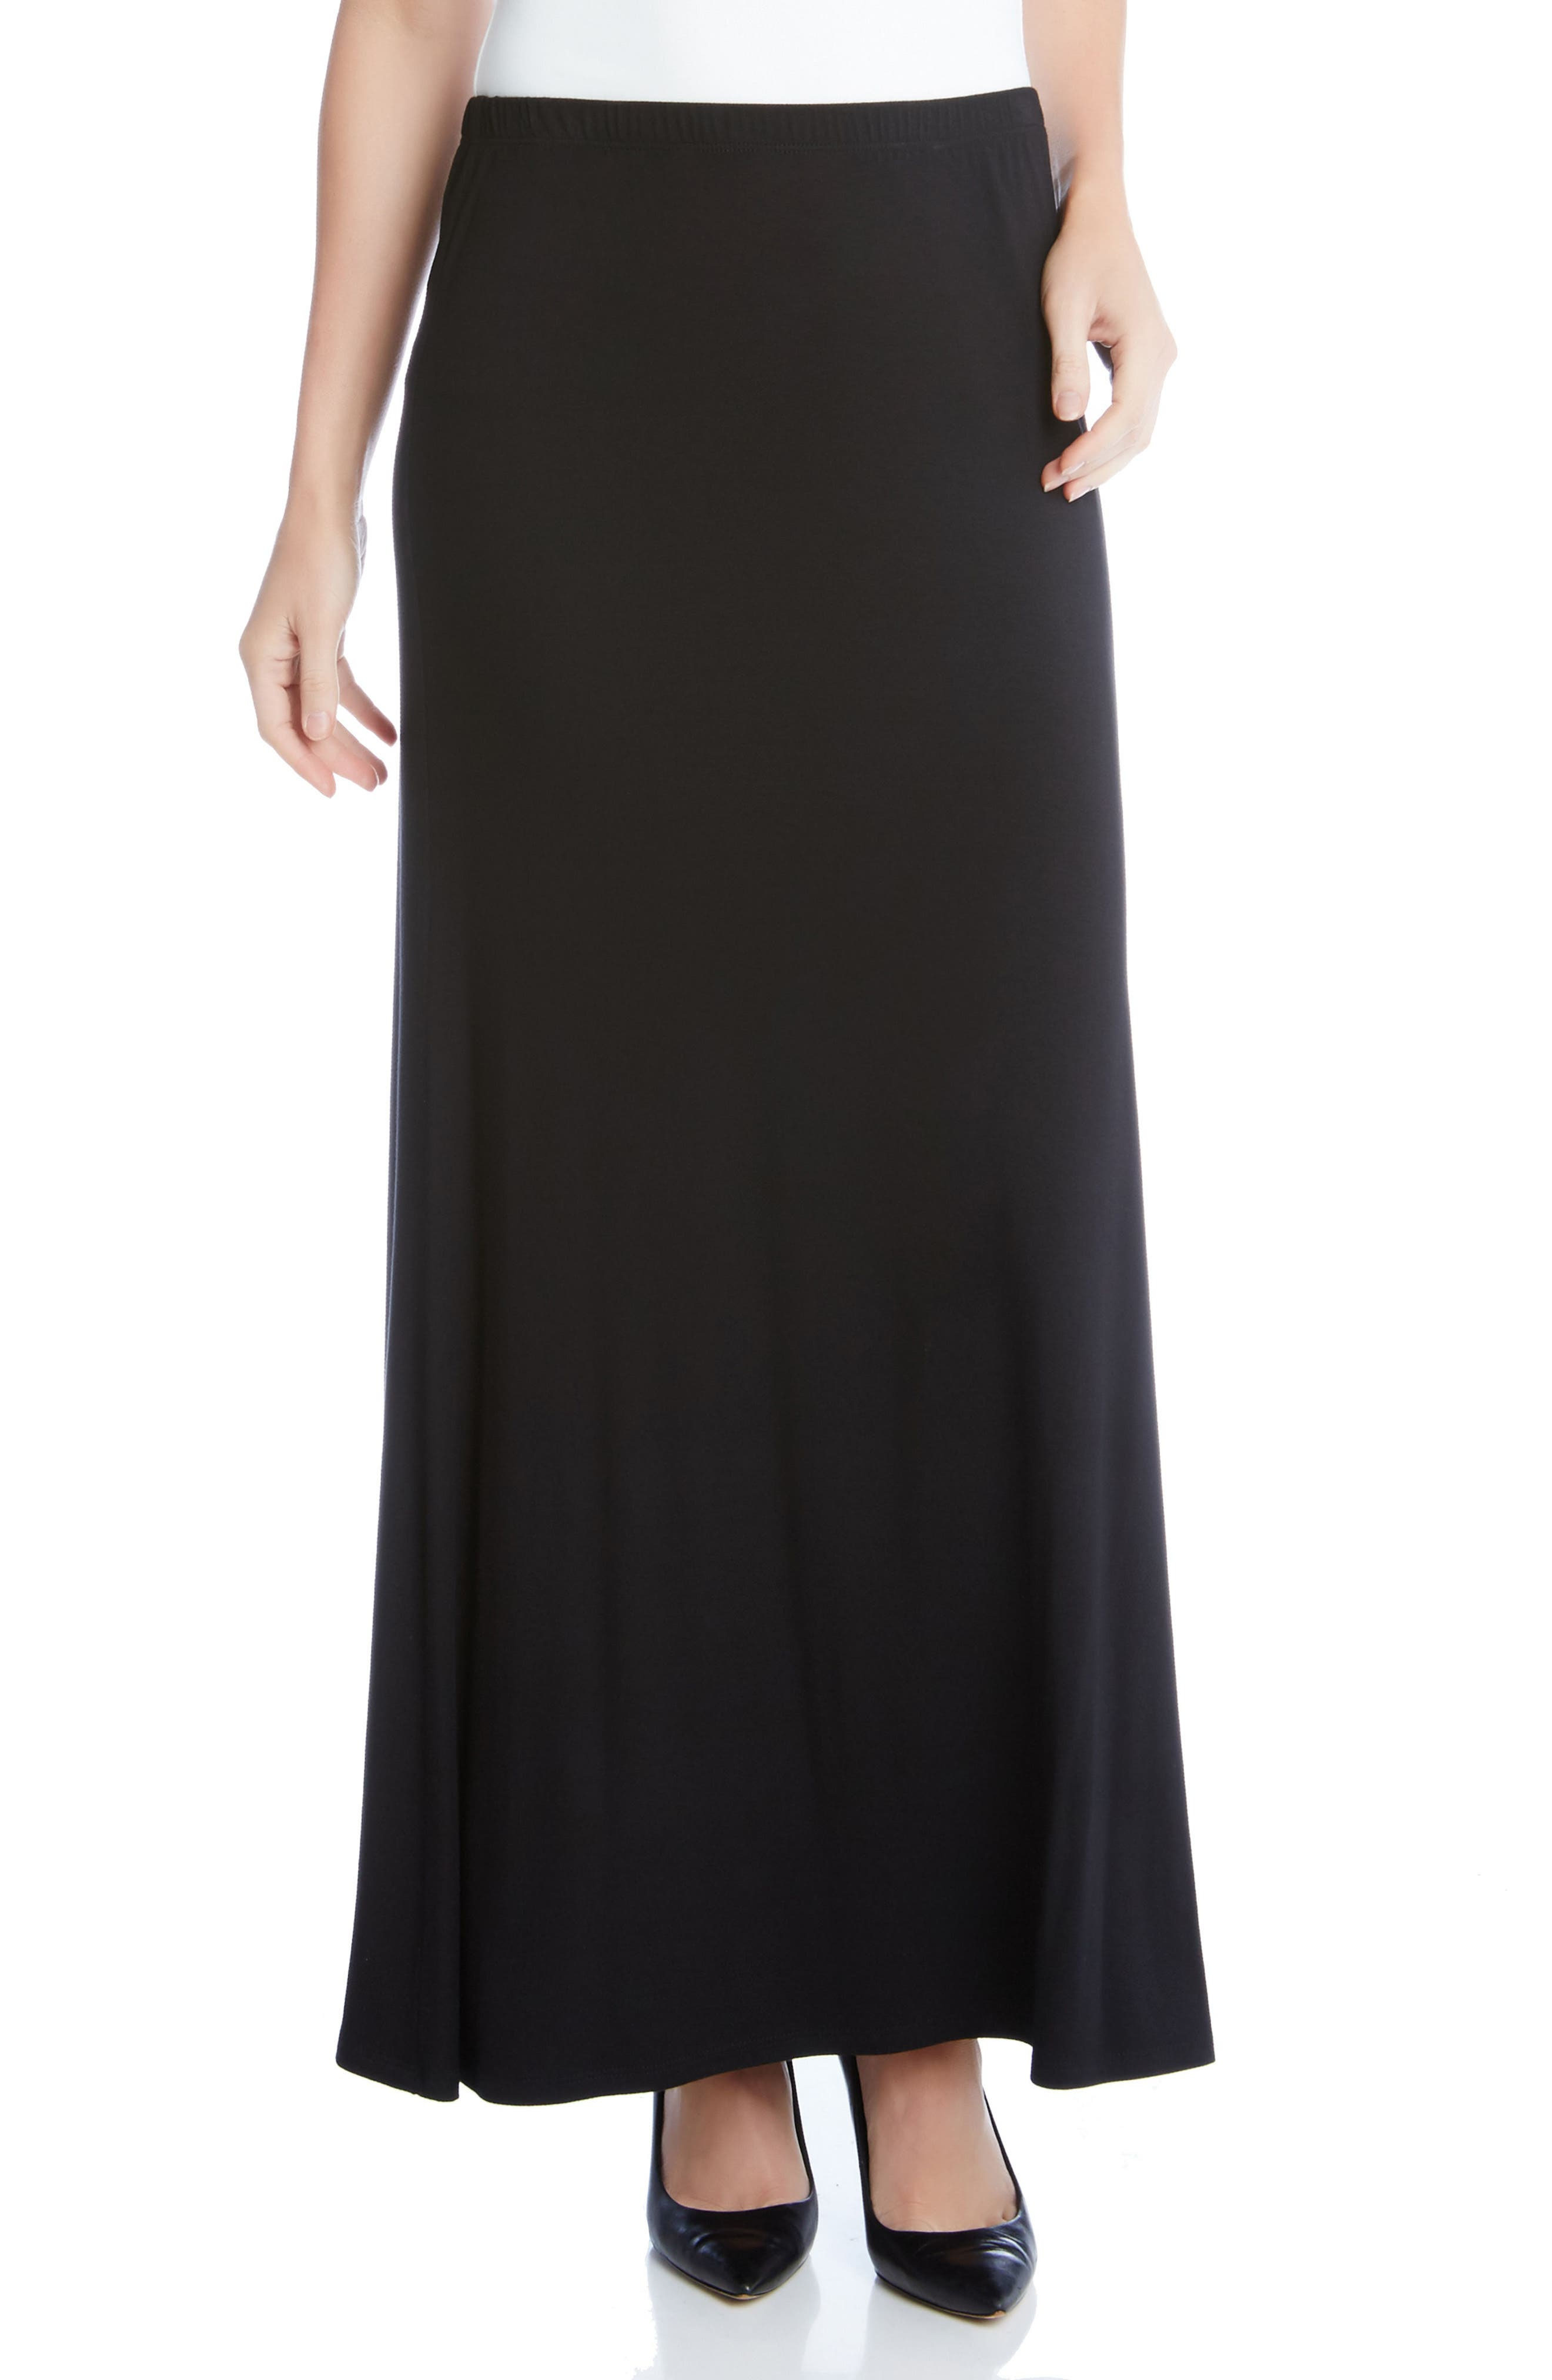 KAREN KANE, Maxi Skirt, Main thumbnail 1, color, BLACK